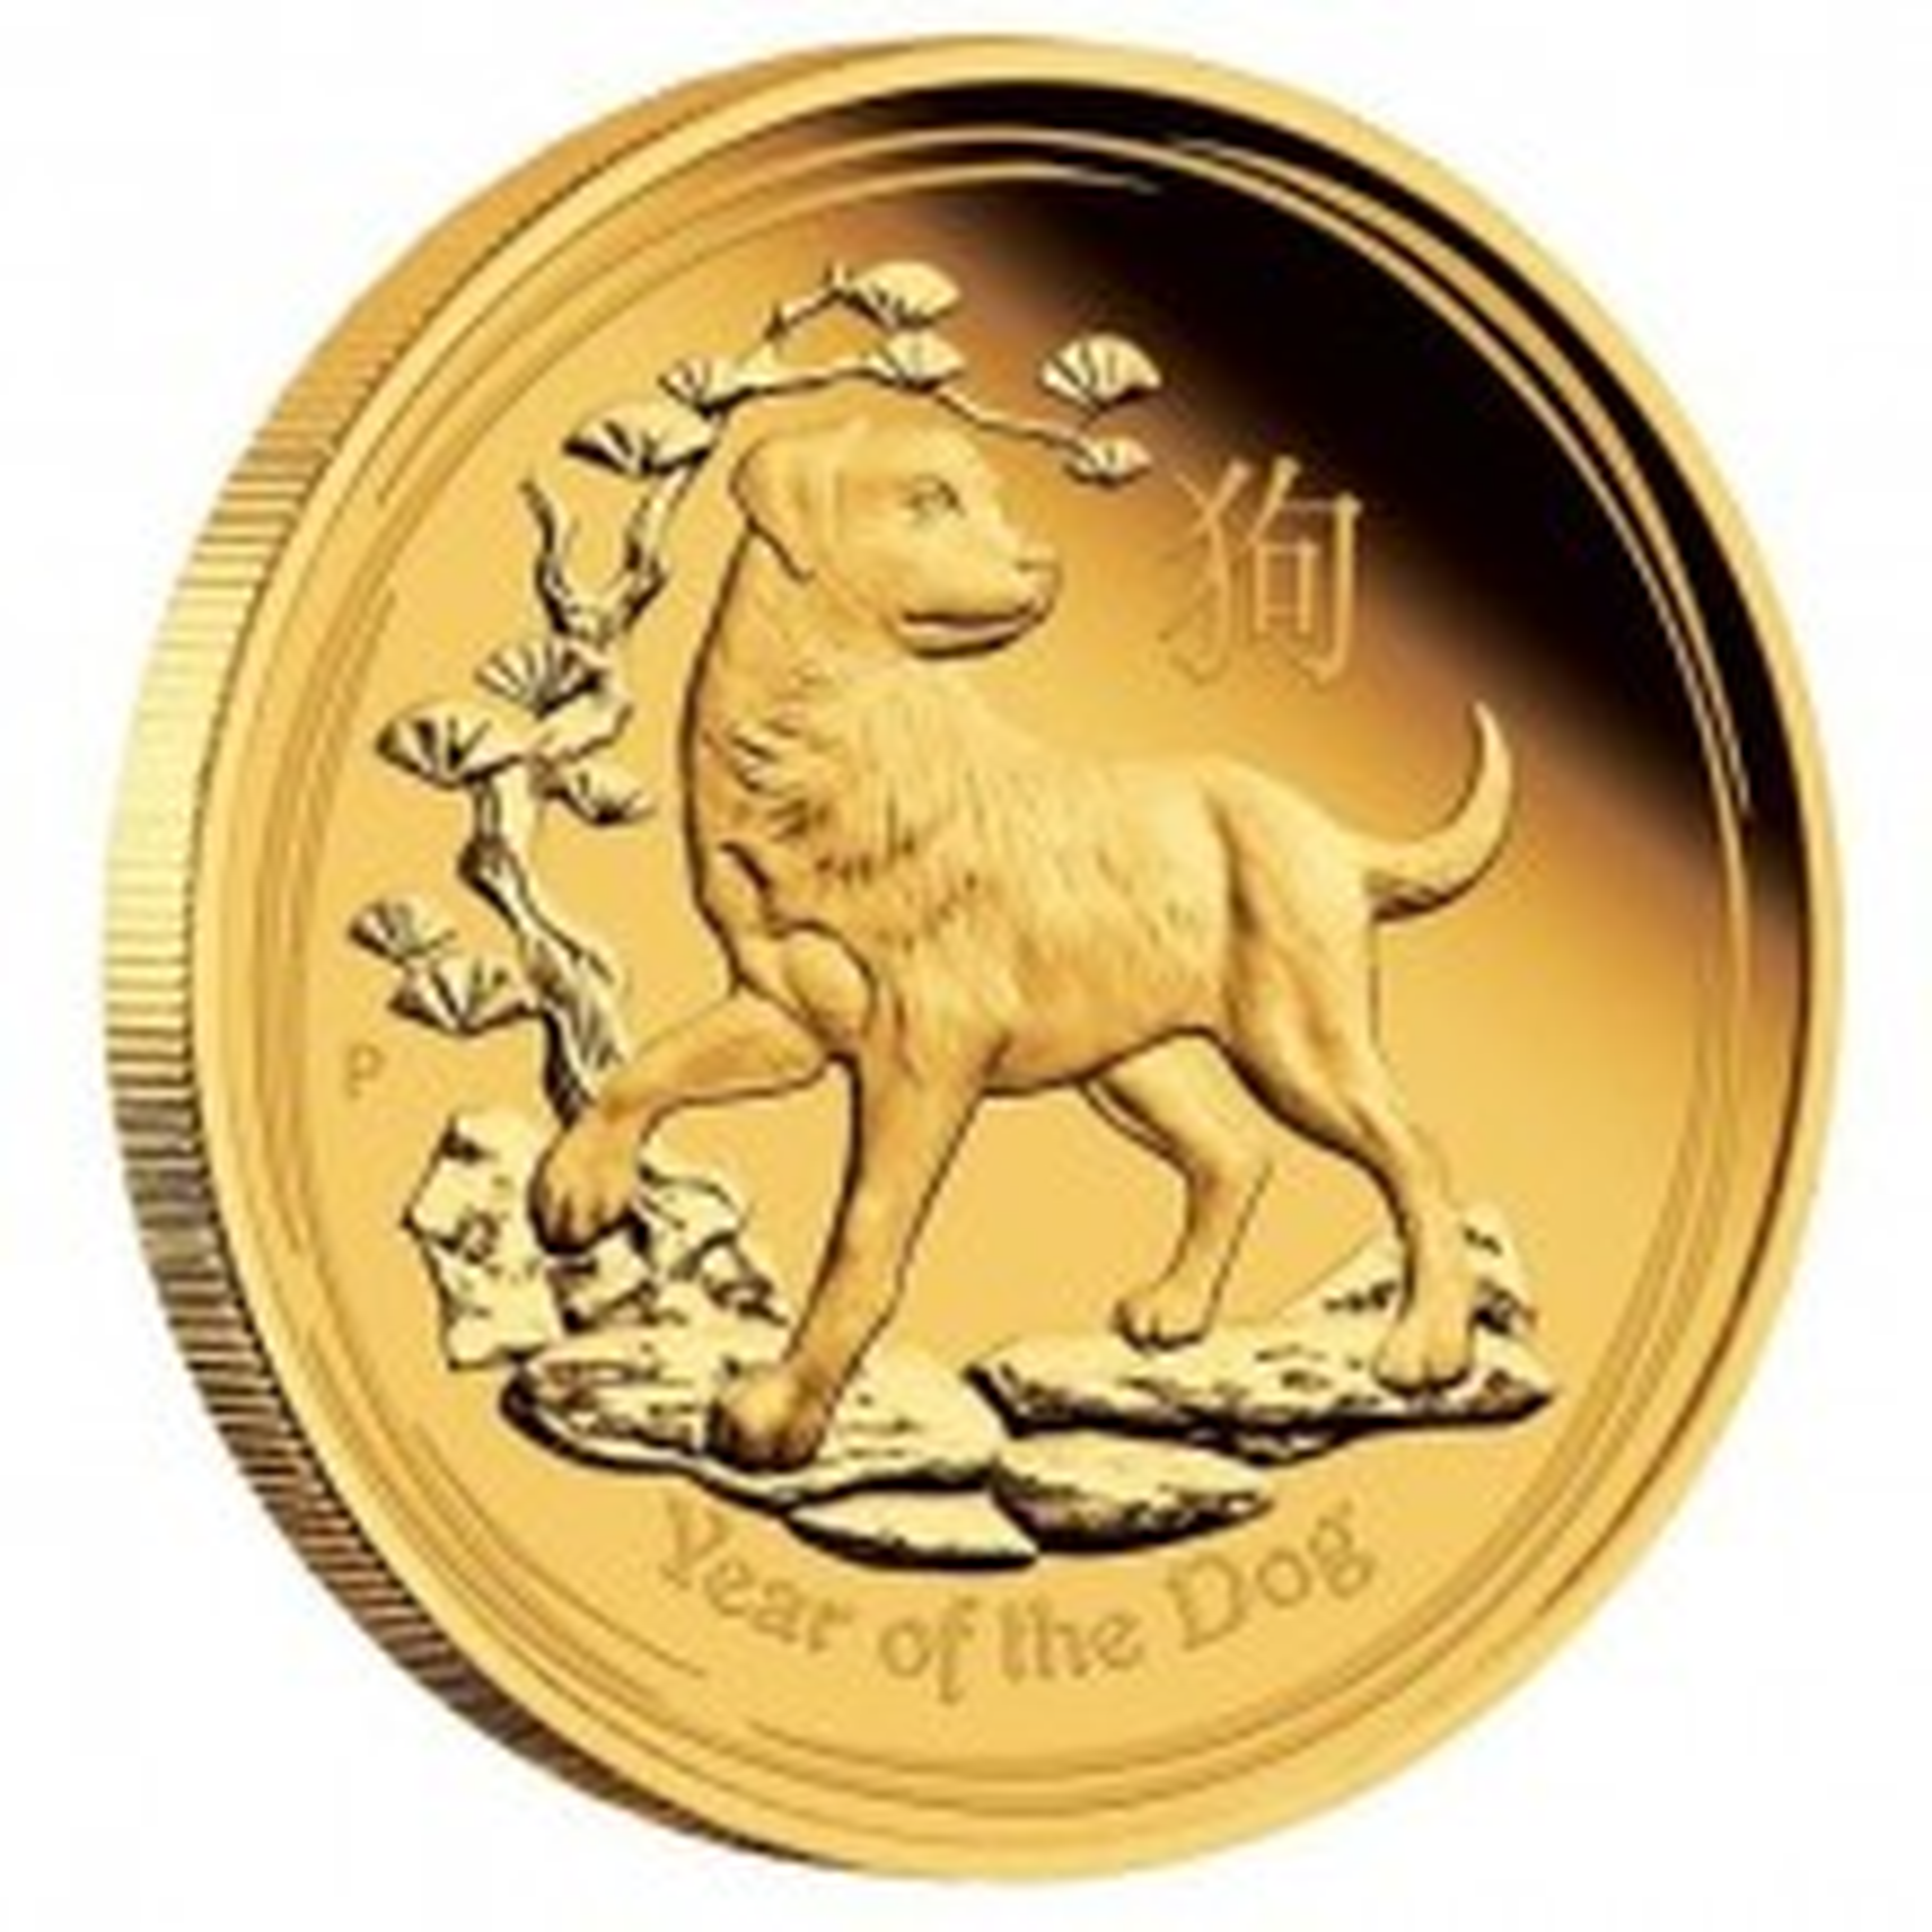 1 troy ounce gouden lunar munt 2018 proof